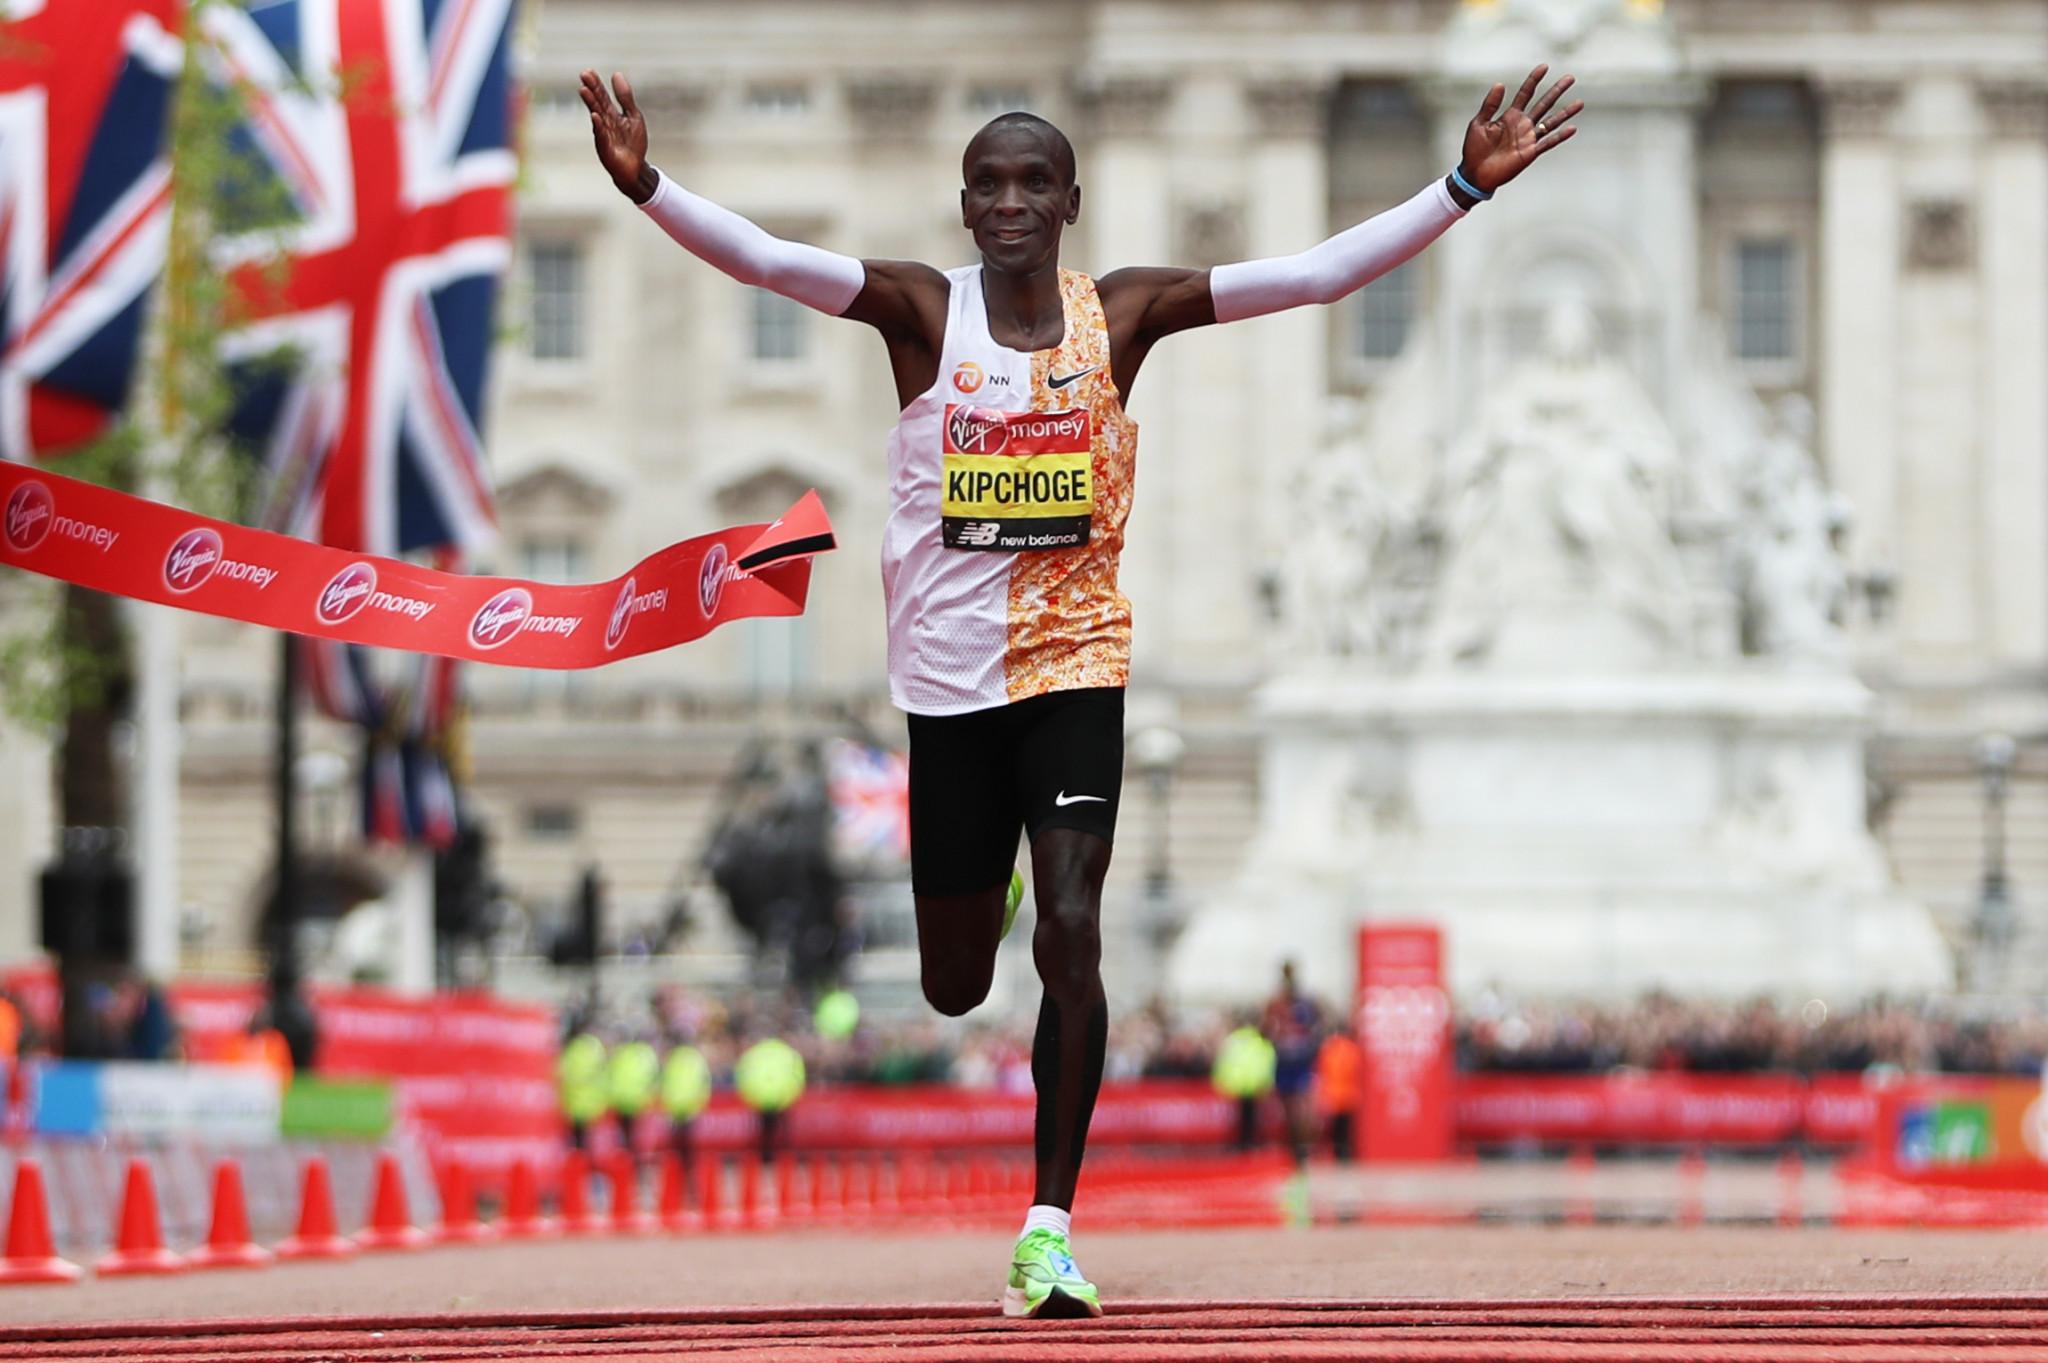 Kipchoge seals fourth Abbott World Marathon Majors title despite Berlin absence